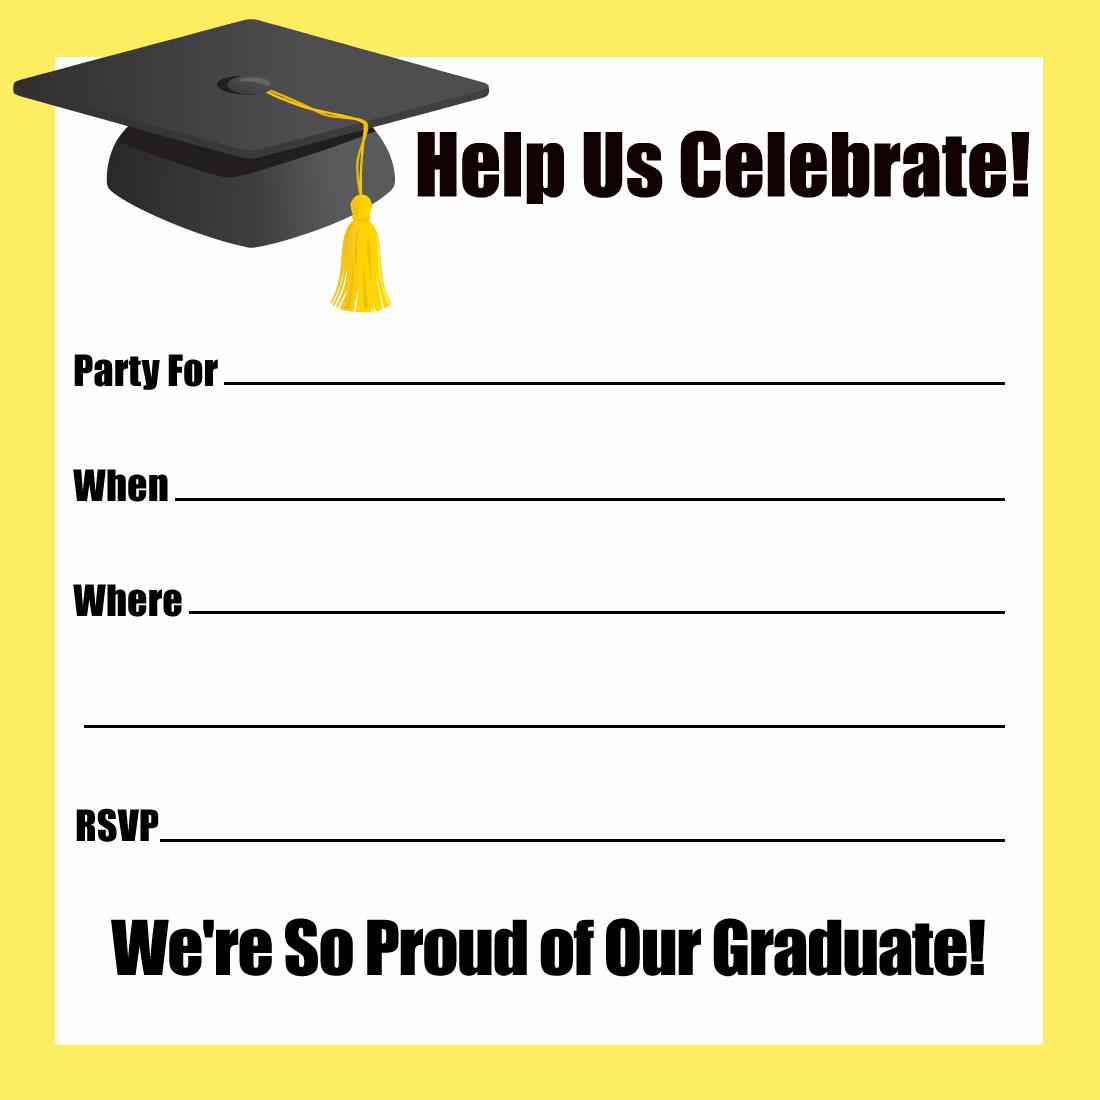 Free Grad Party Invitation Templates Elegant Free Printable Graduation Party Invitations Templates